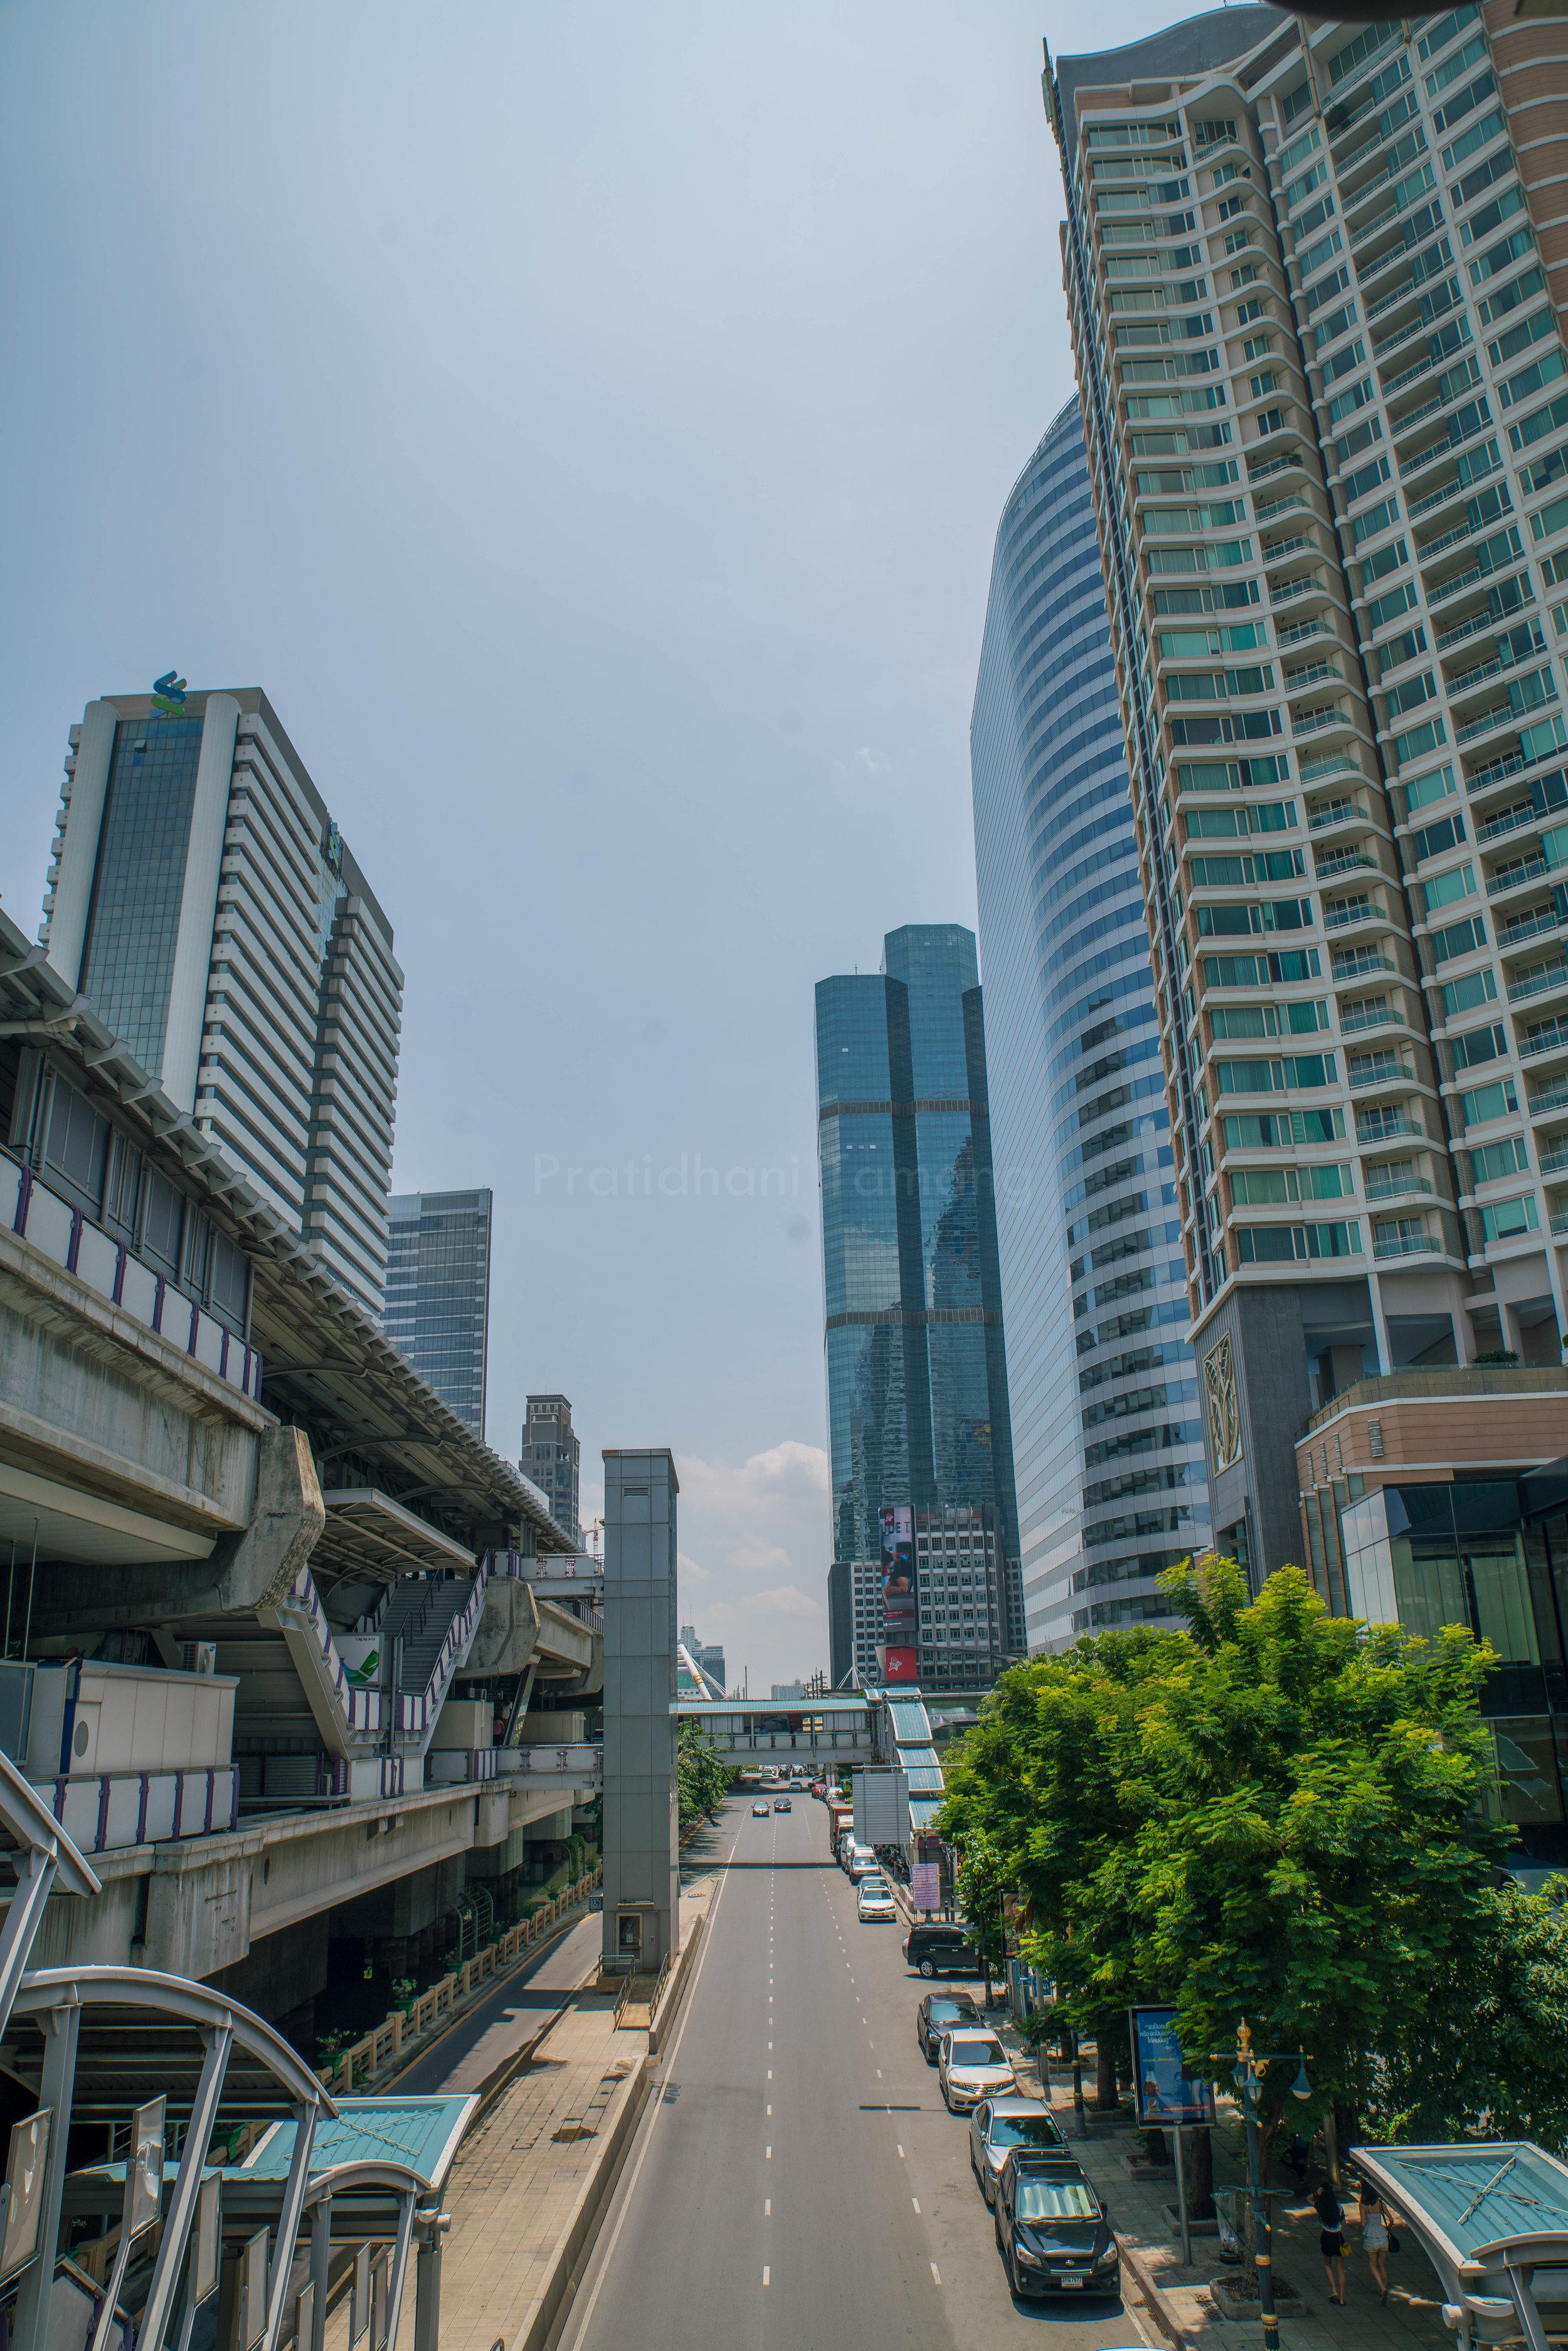 Heart of the city, Bangkok.